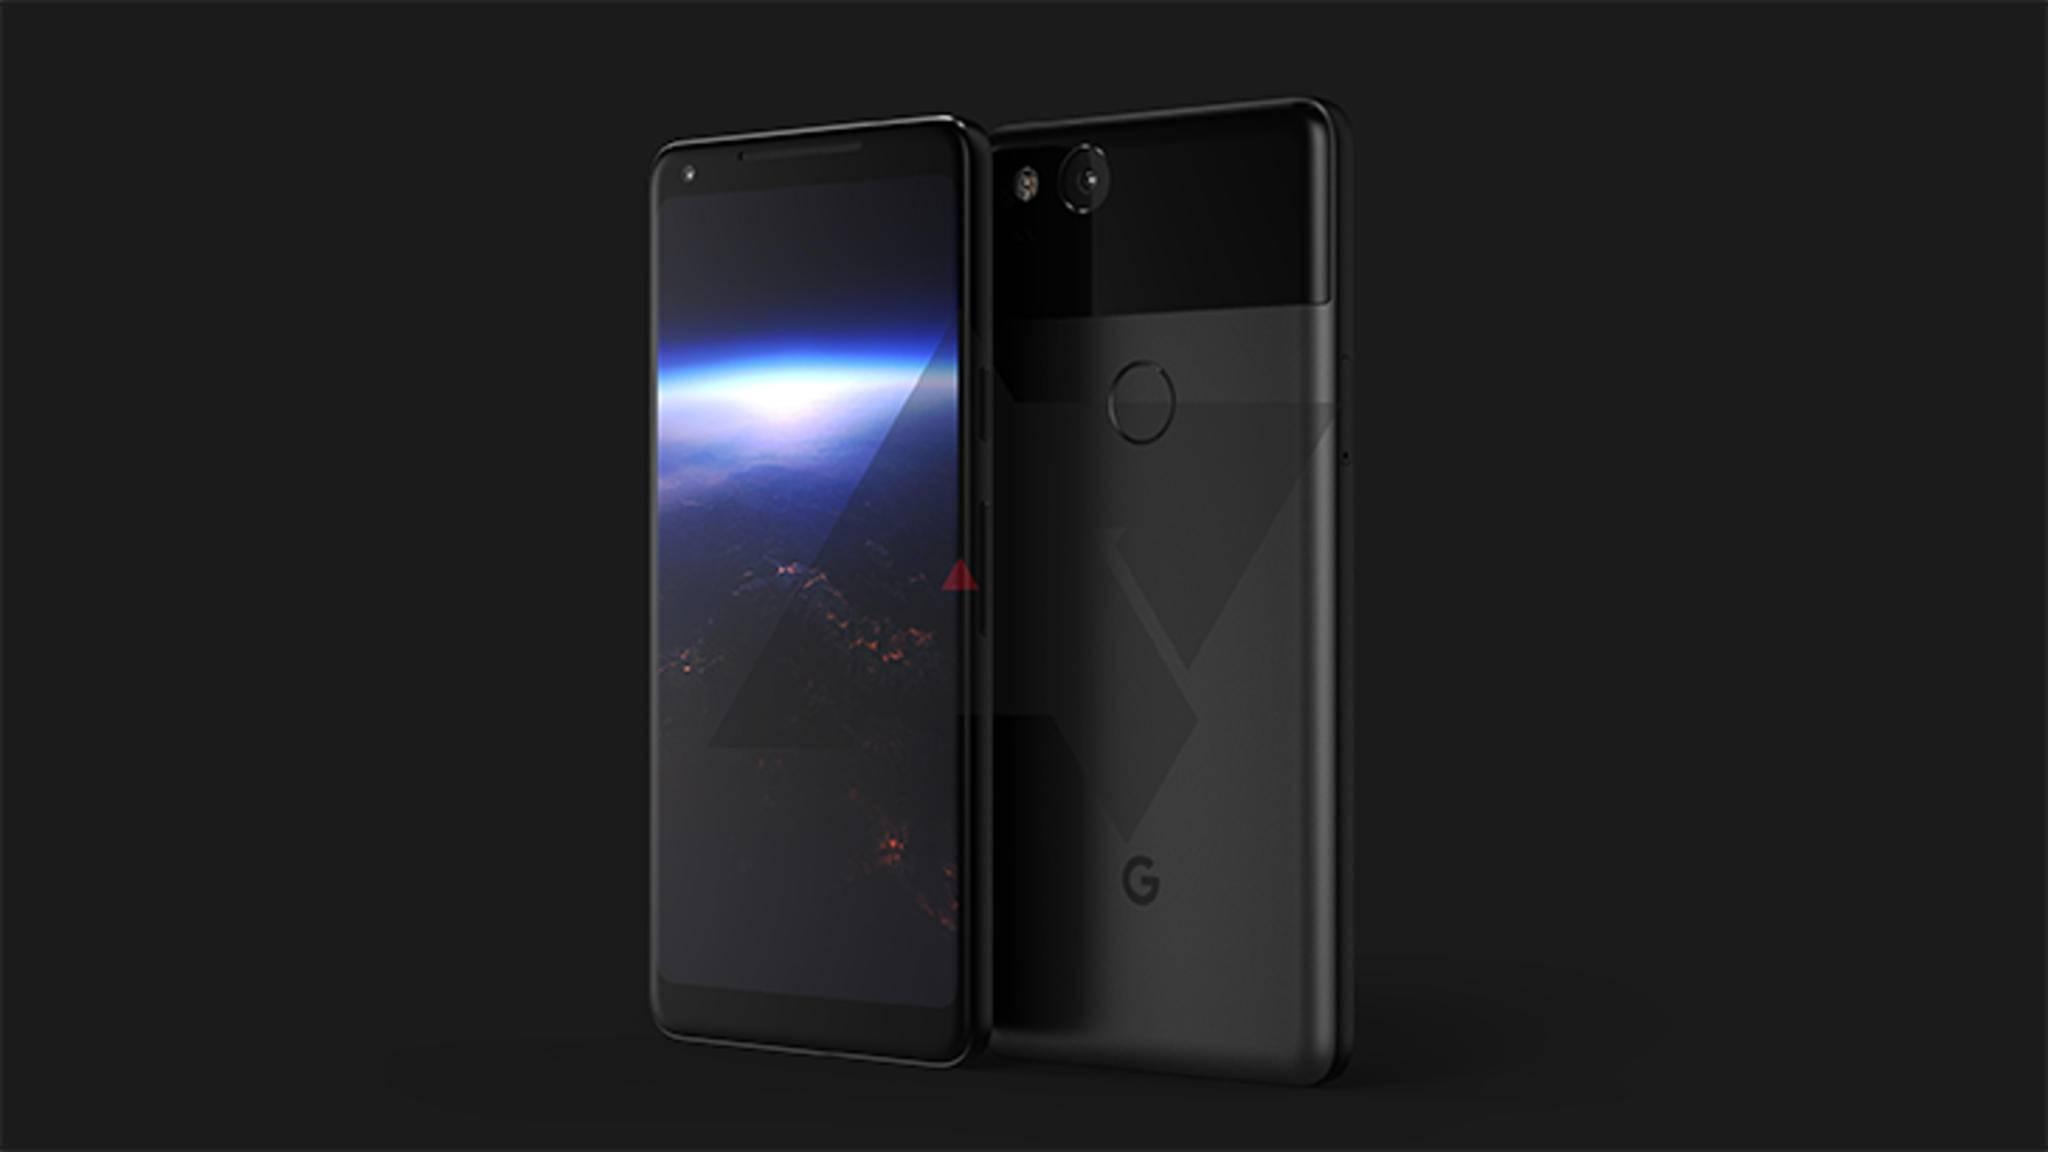 So soll das Google Pixel 2 XL aussehen.